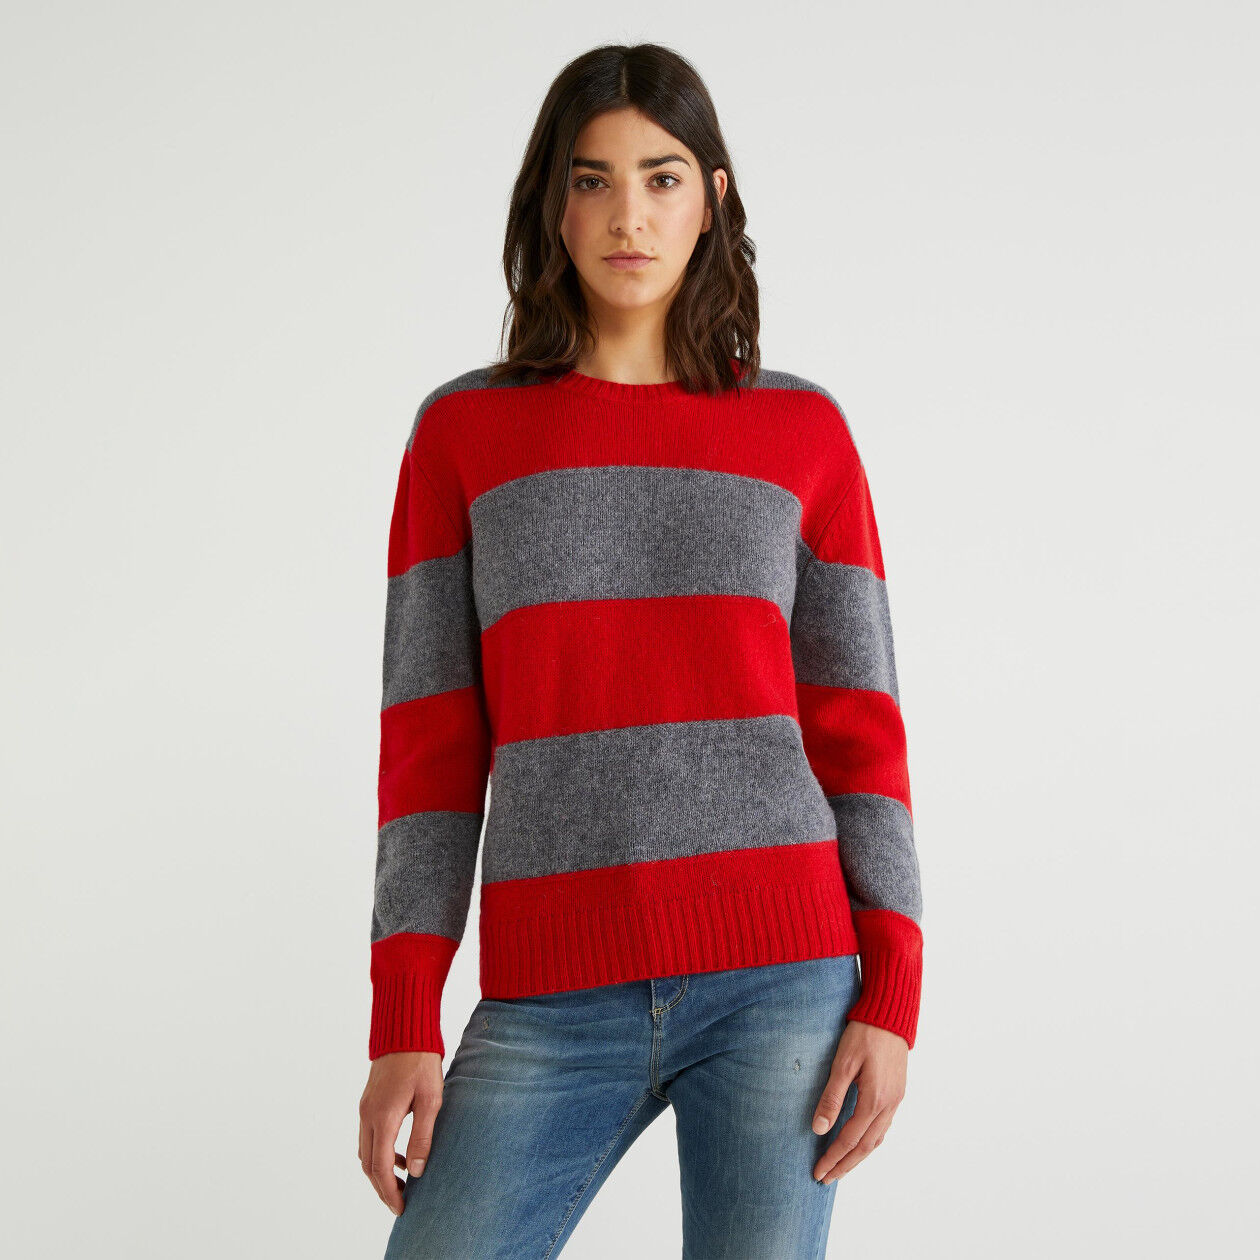 Camisola de lã shetland